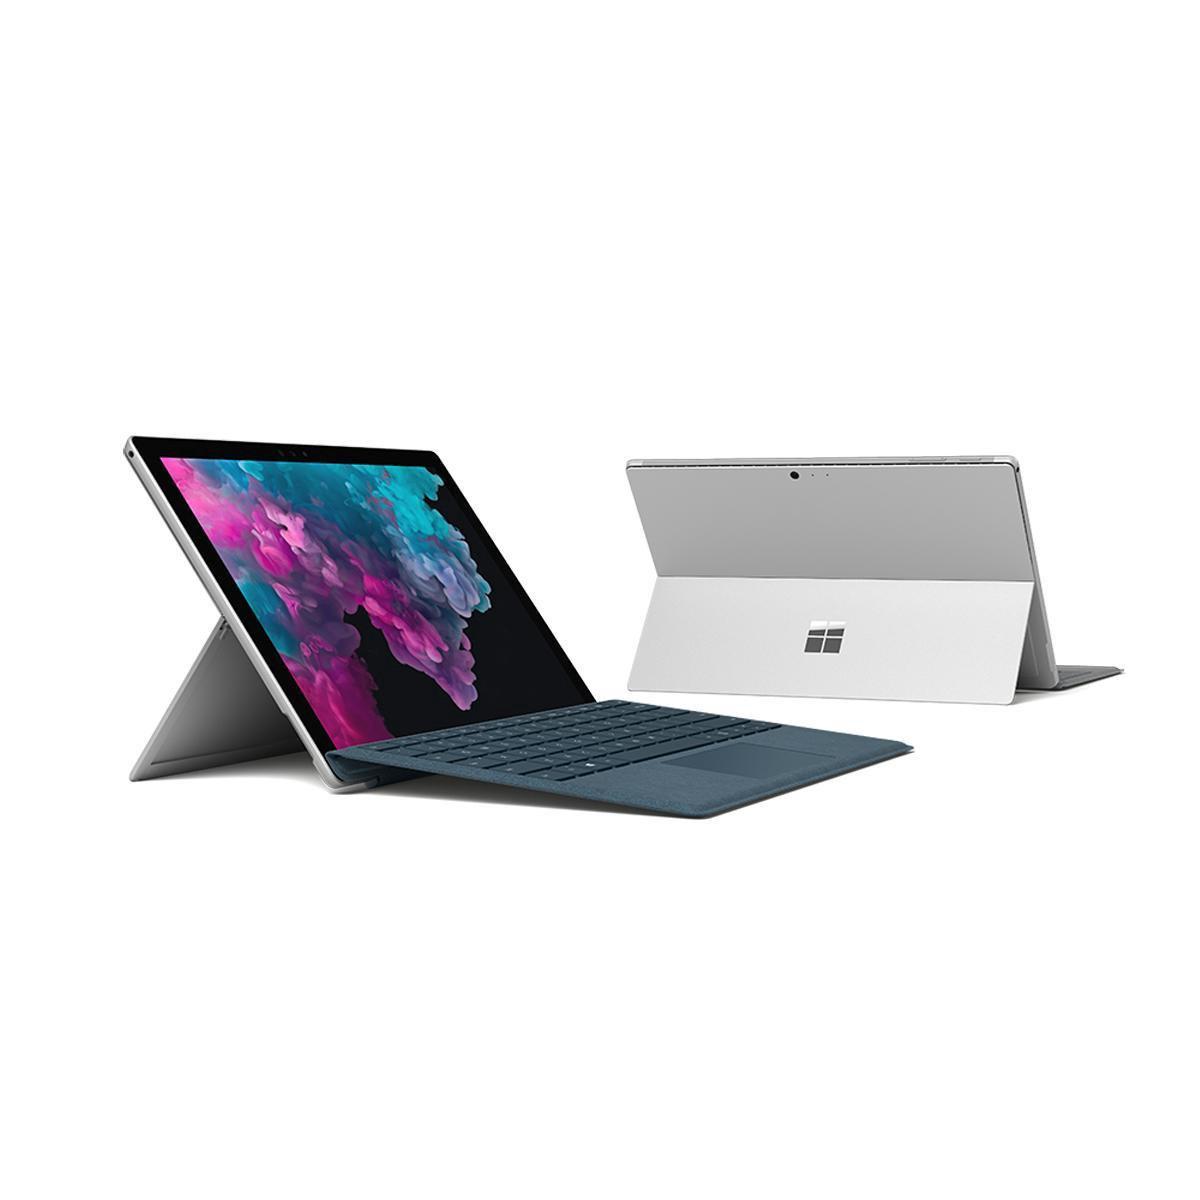 Microsoft Surface Pro 6 (2019) – 12.3 inch – Core i5 – 128GB – Grijs